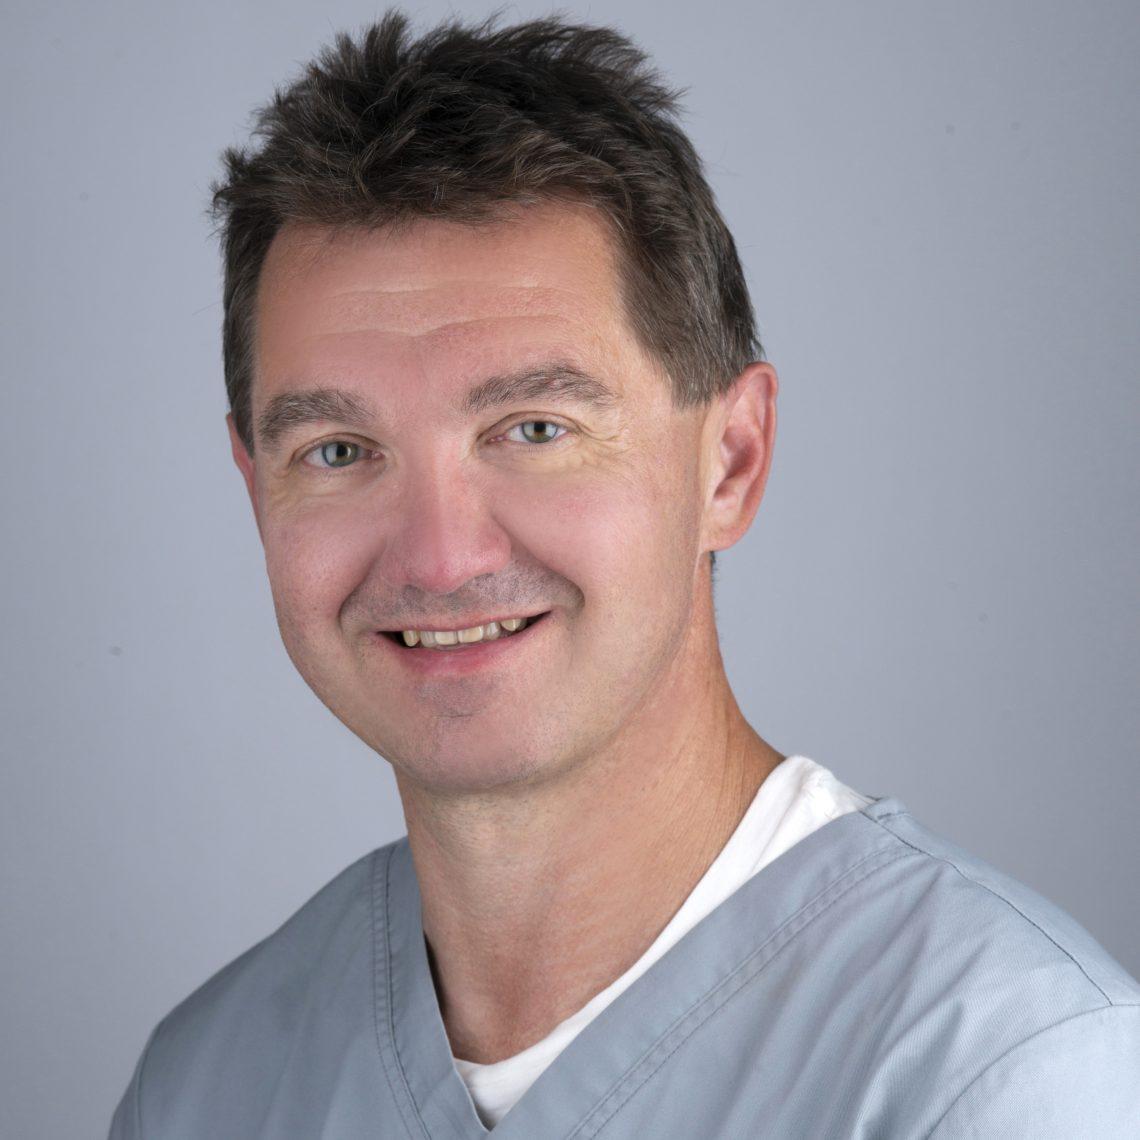 Maciej Gawęcki, M.D., Ph.D. - zdjęcie